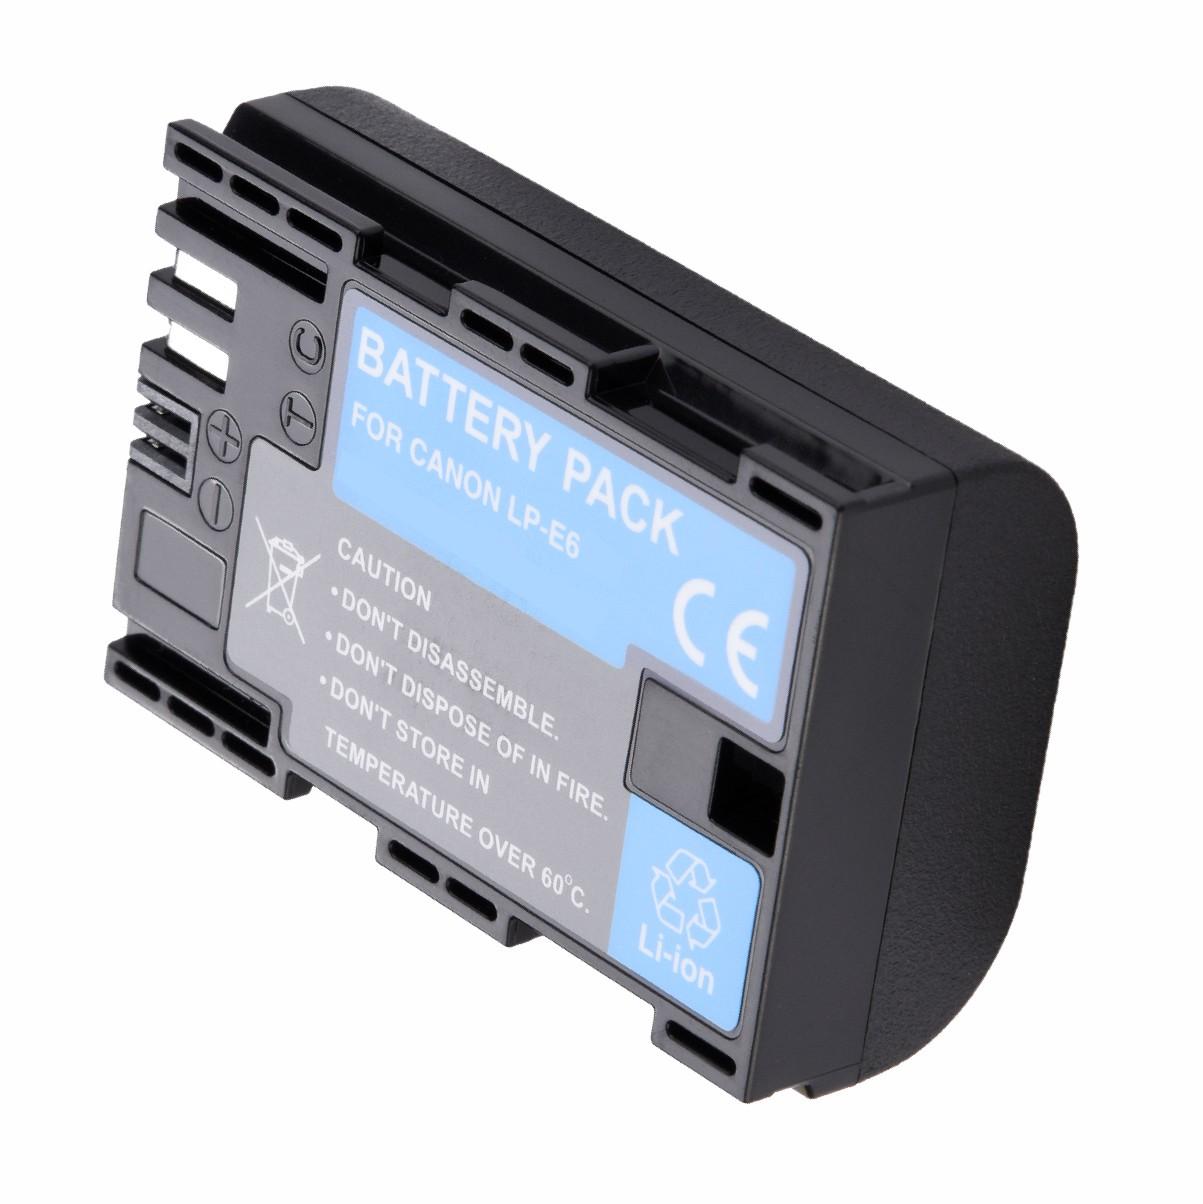 KIT Grip Para Blackmagic + 2 Baterias LP-E6 + Carregador